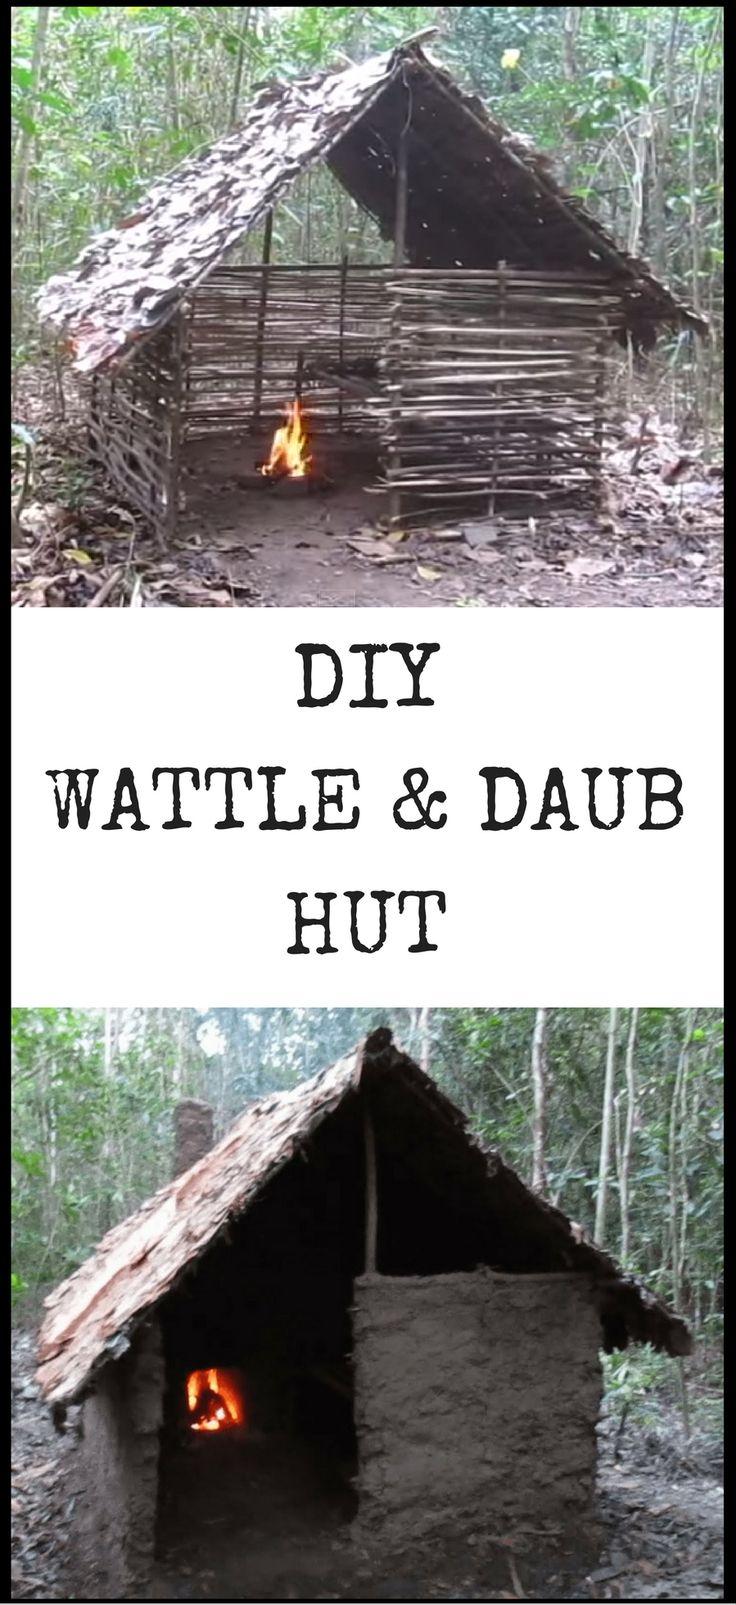 DIY Wattle and Daub Hut http://vid.staged.com/Yjgt